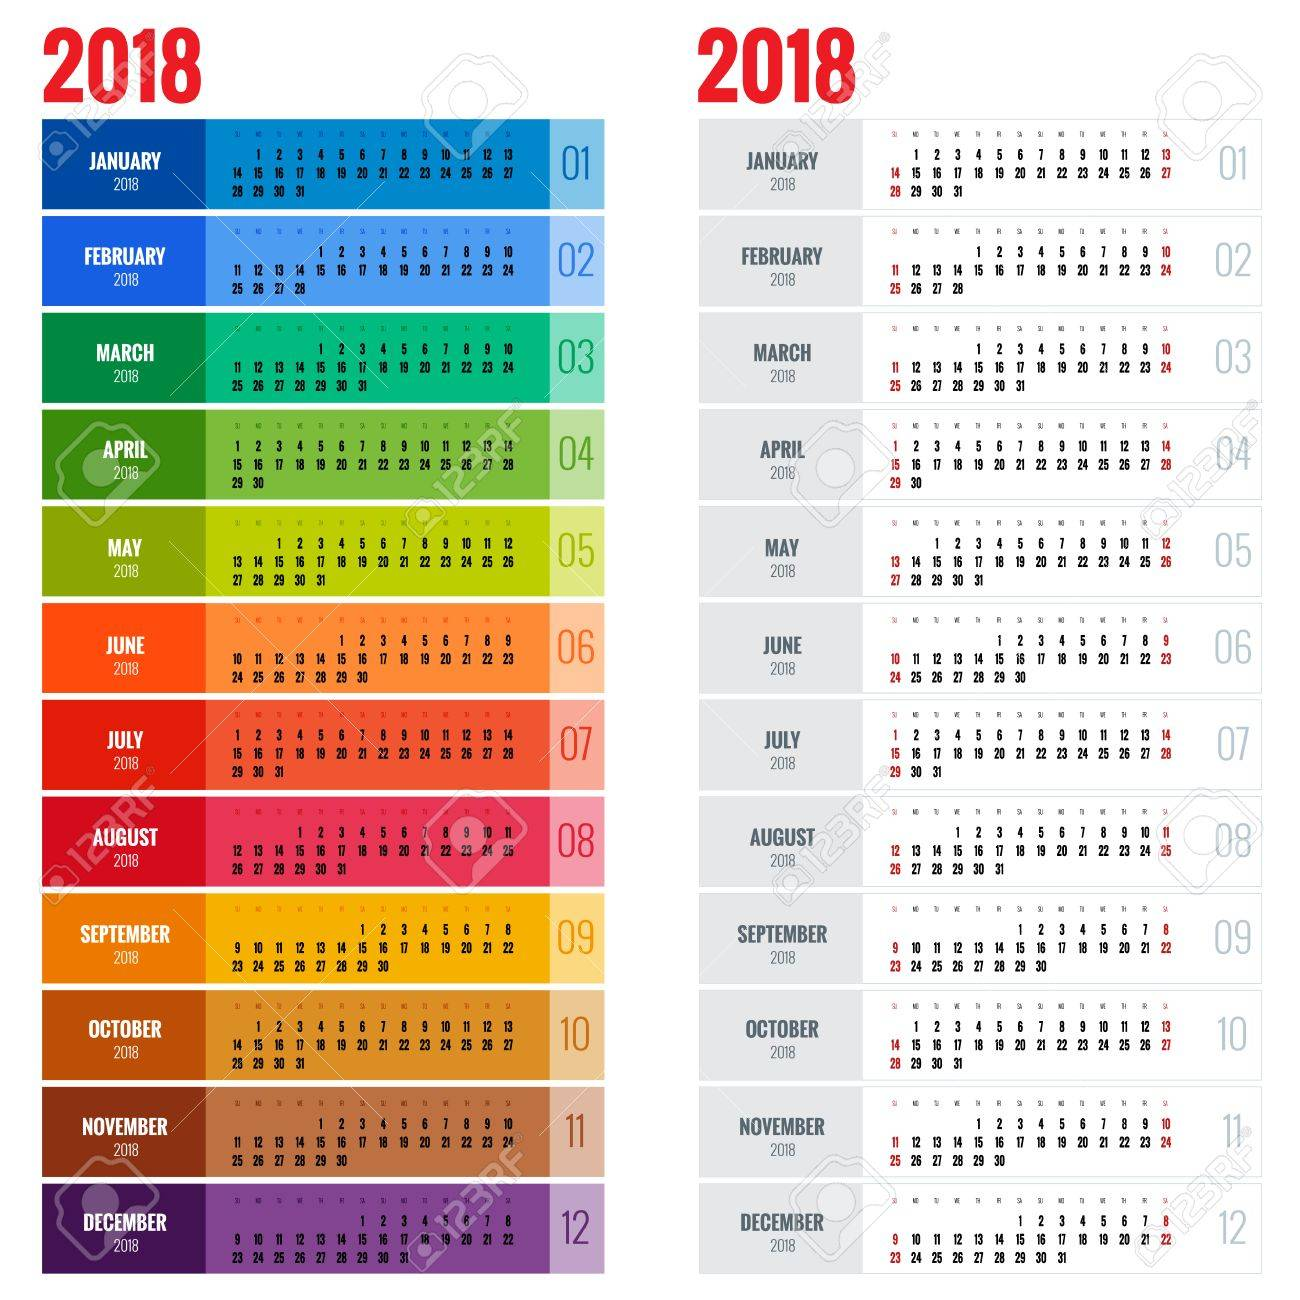 Plantilla De Planificador De Calendario De Pared Anual Para 2018 Año ...